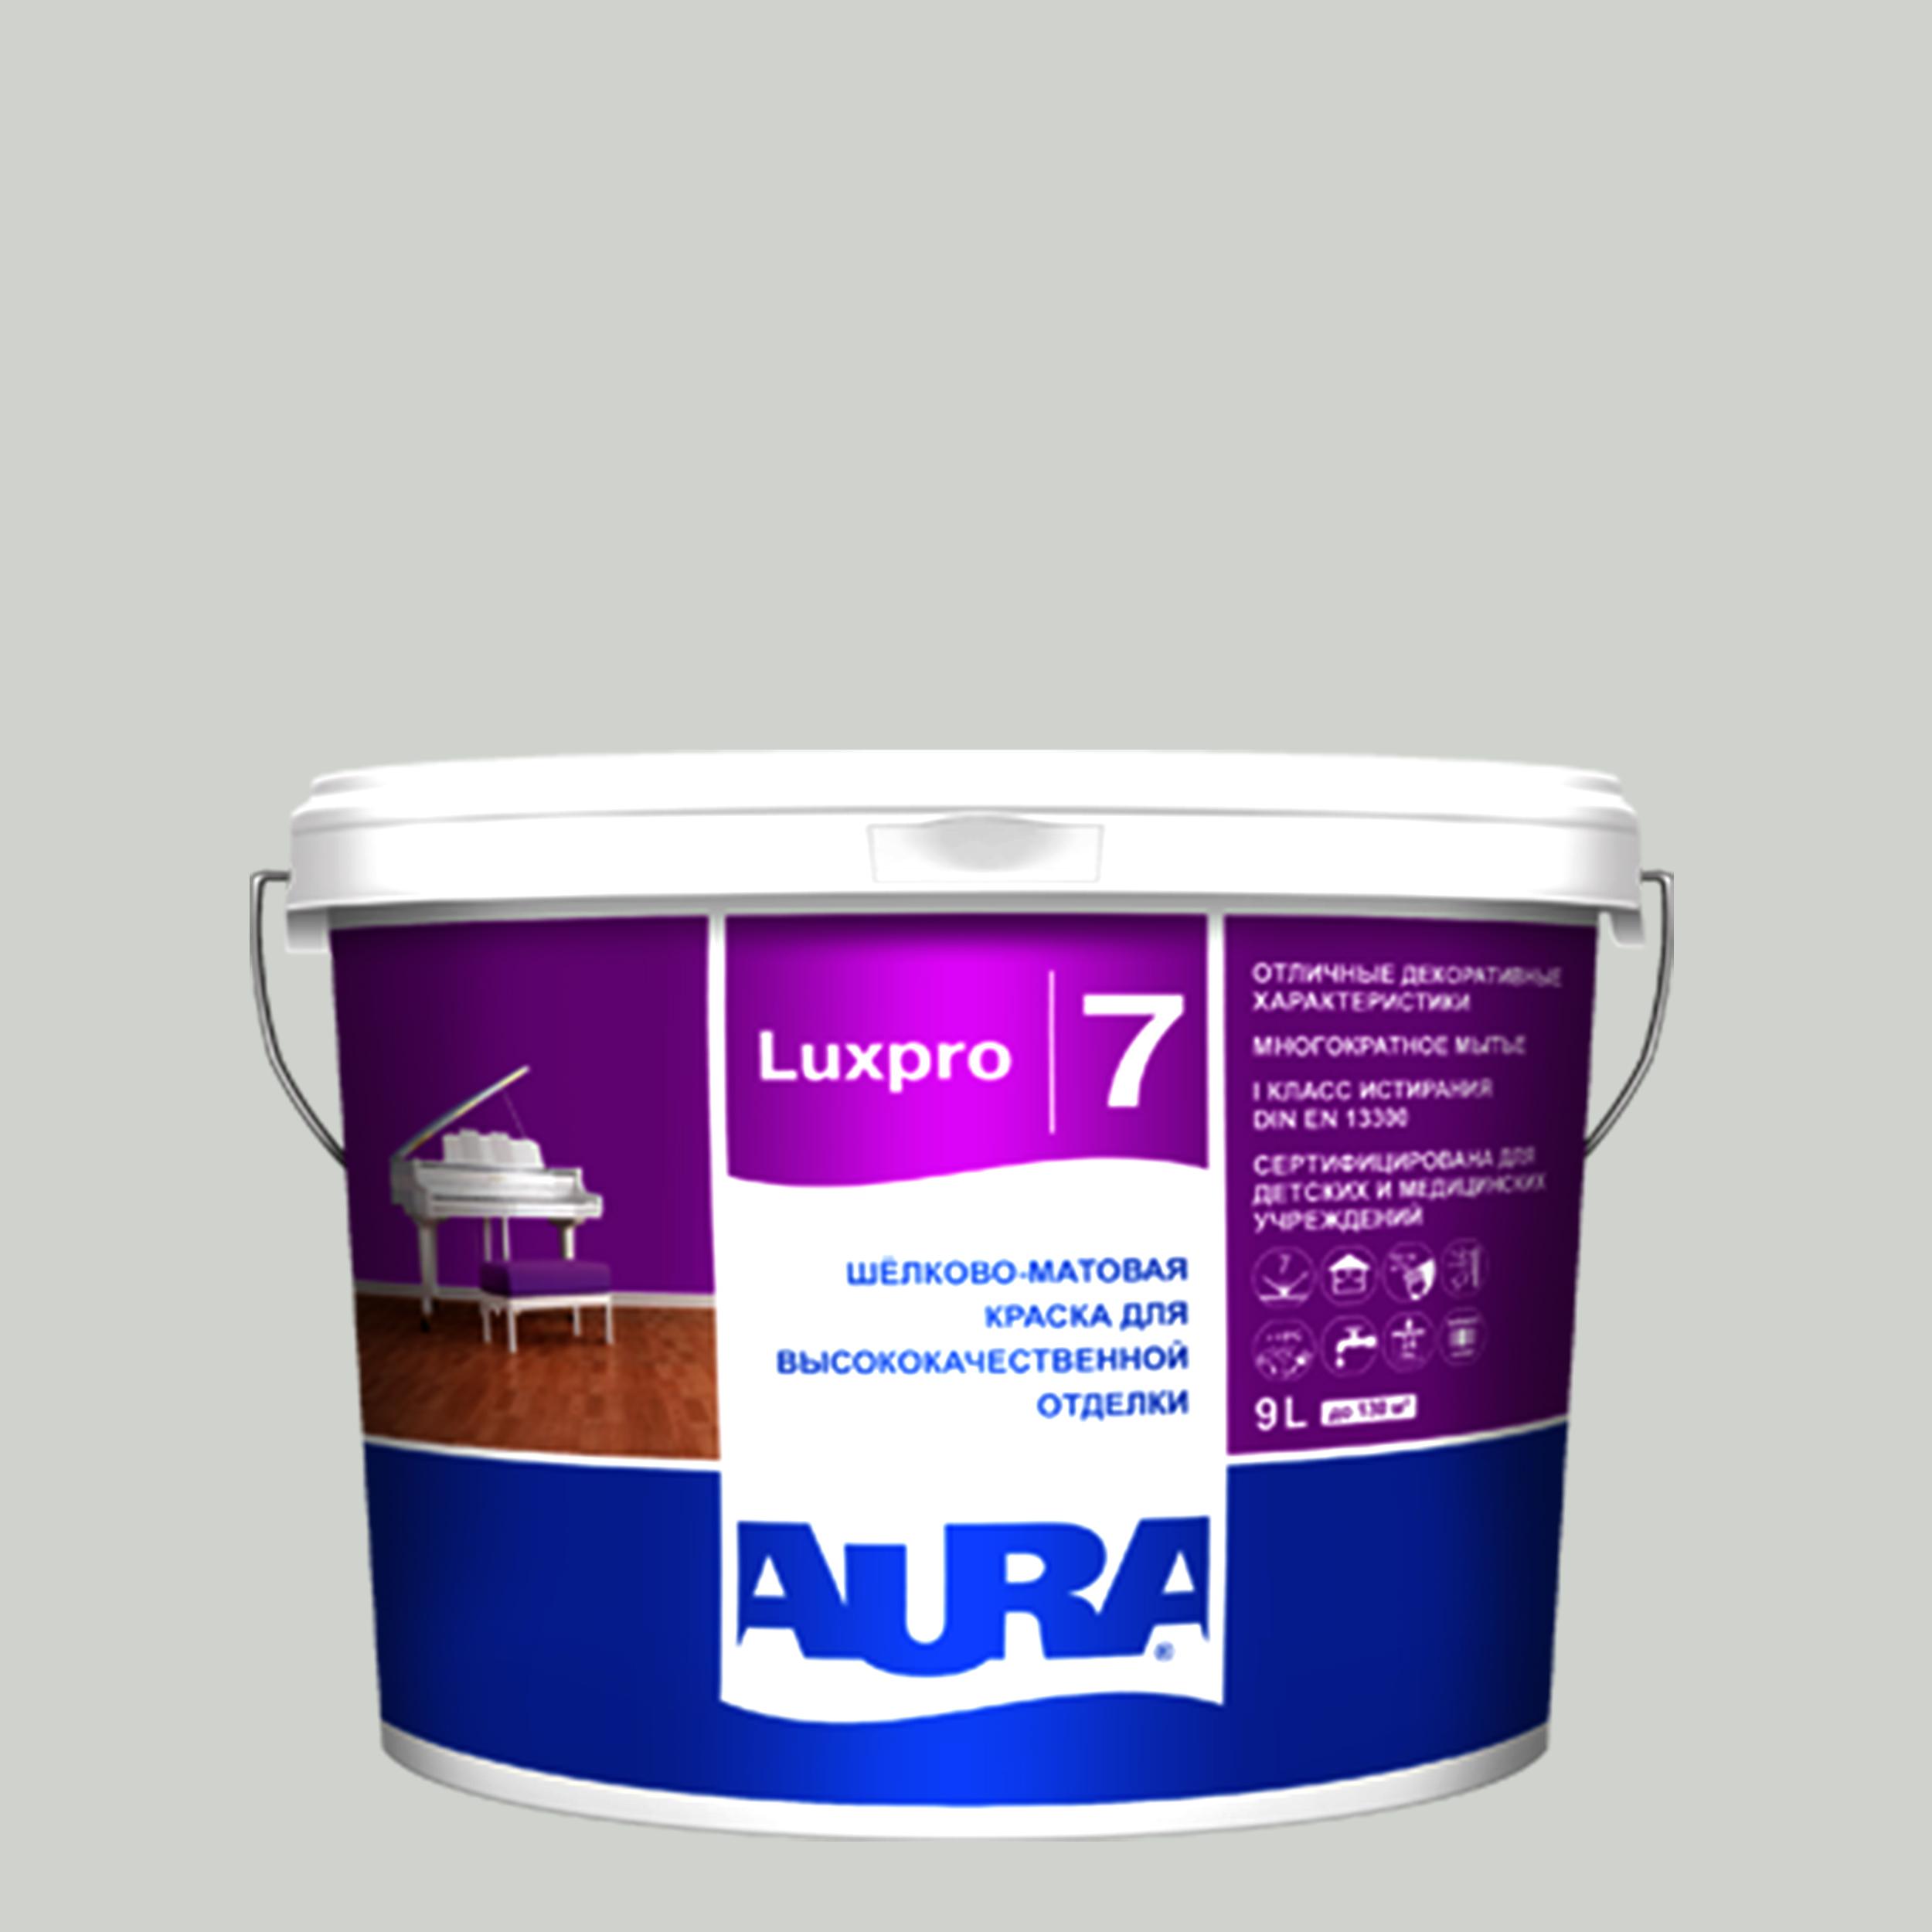 Фото 4 - Краска интерьерная, Aura LuxPRO 7, RAL 6011, 11 кг.